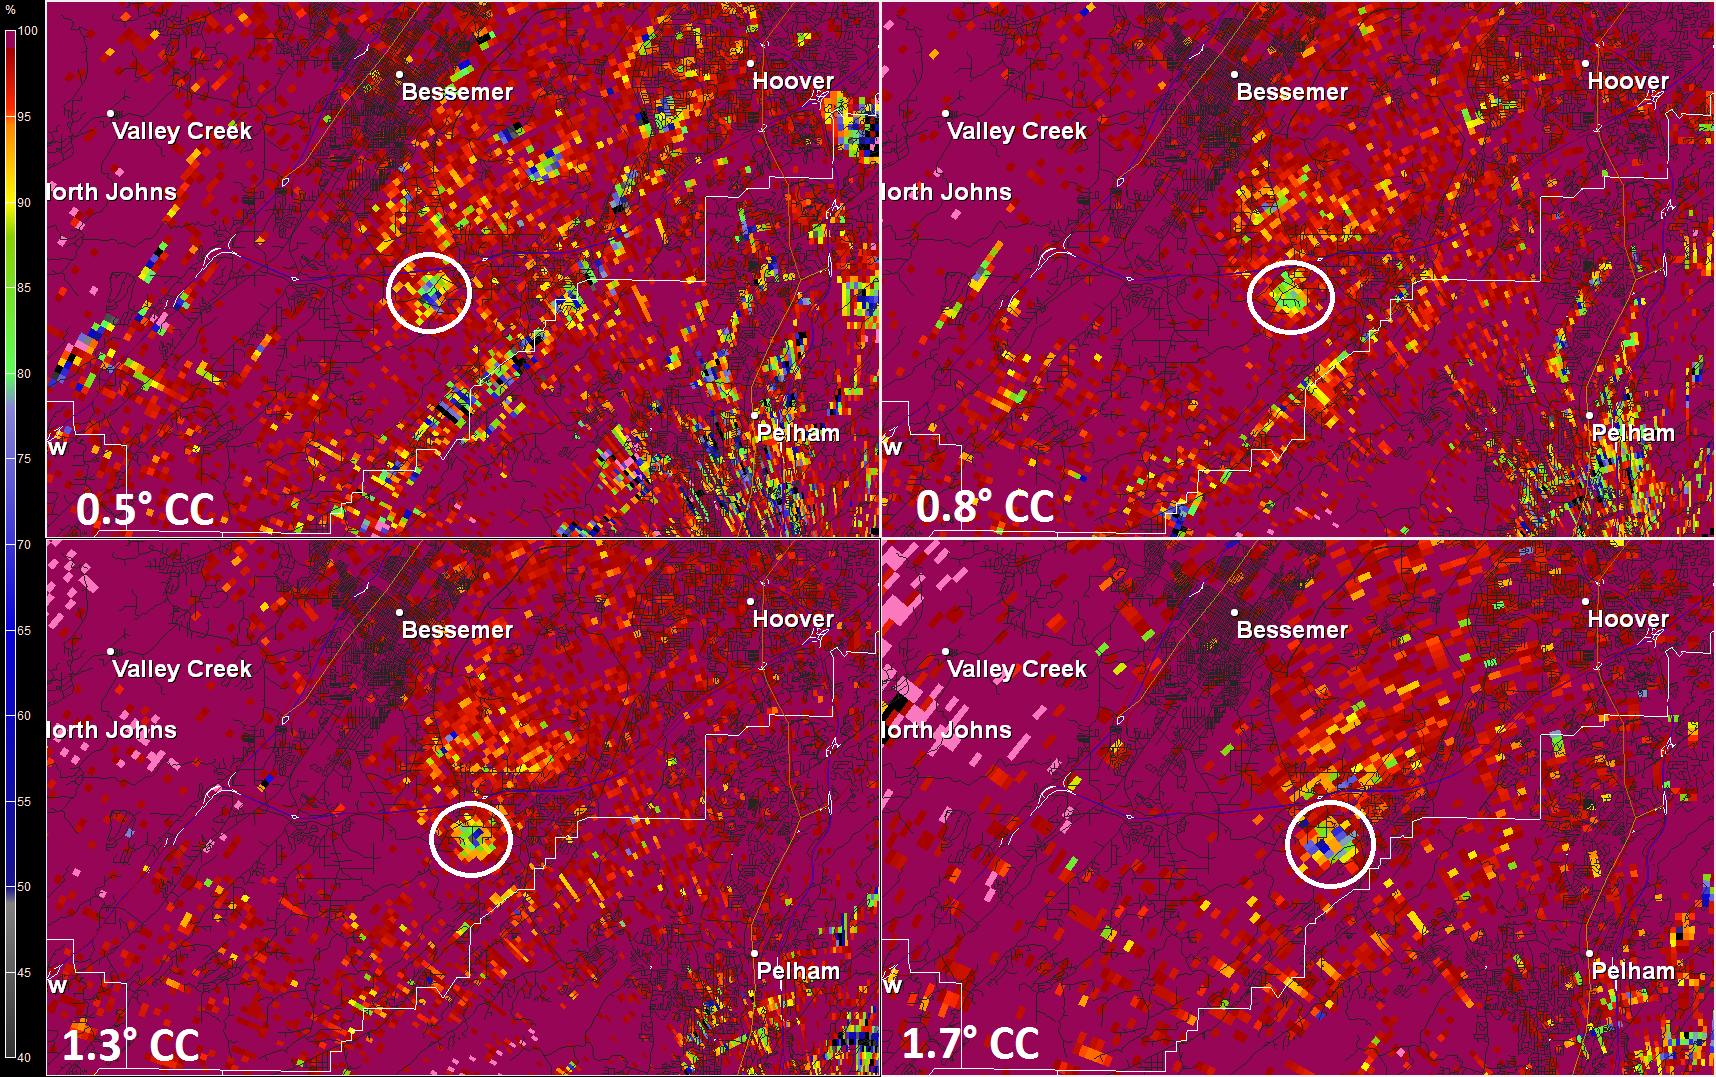 Tornado debris signature detected on the Birmingham Nexrad radar as Tuesday night's tornado was happening (Image: WHNT News 19)